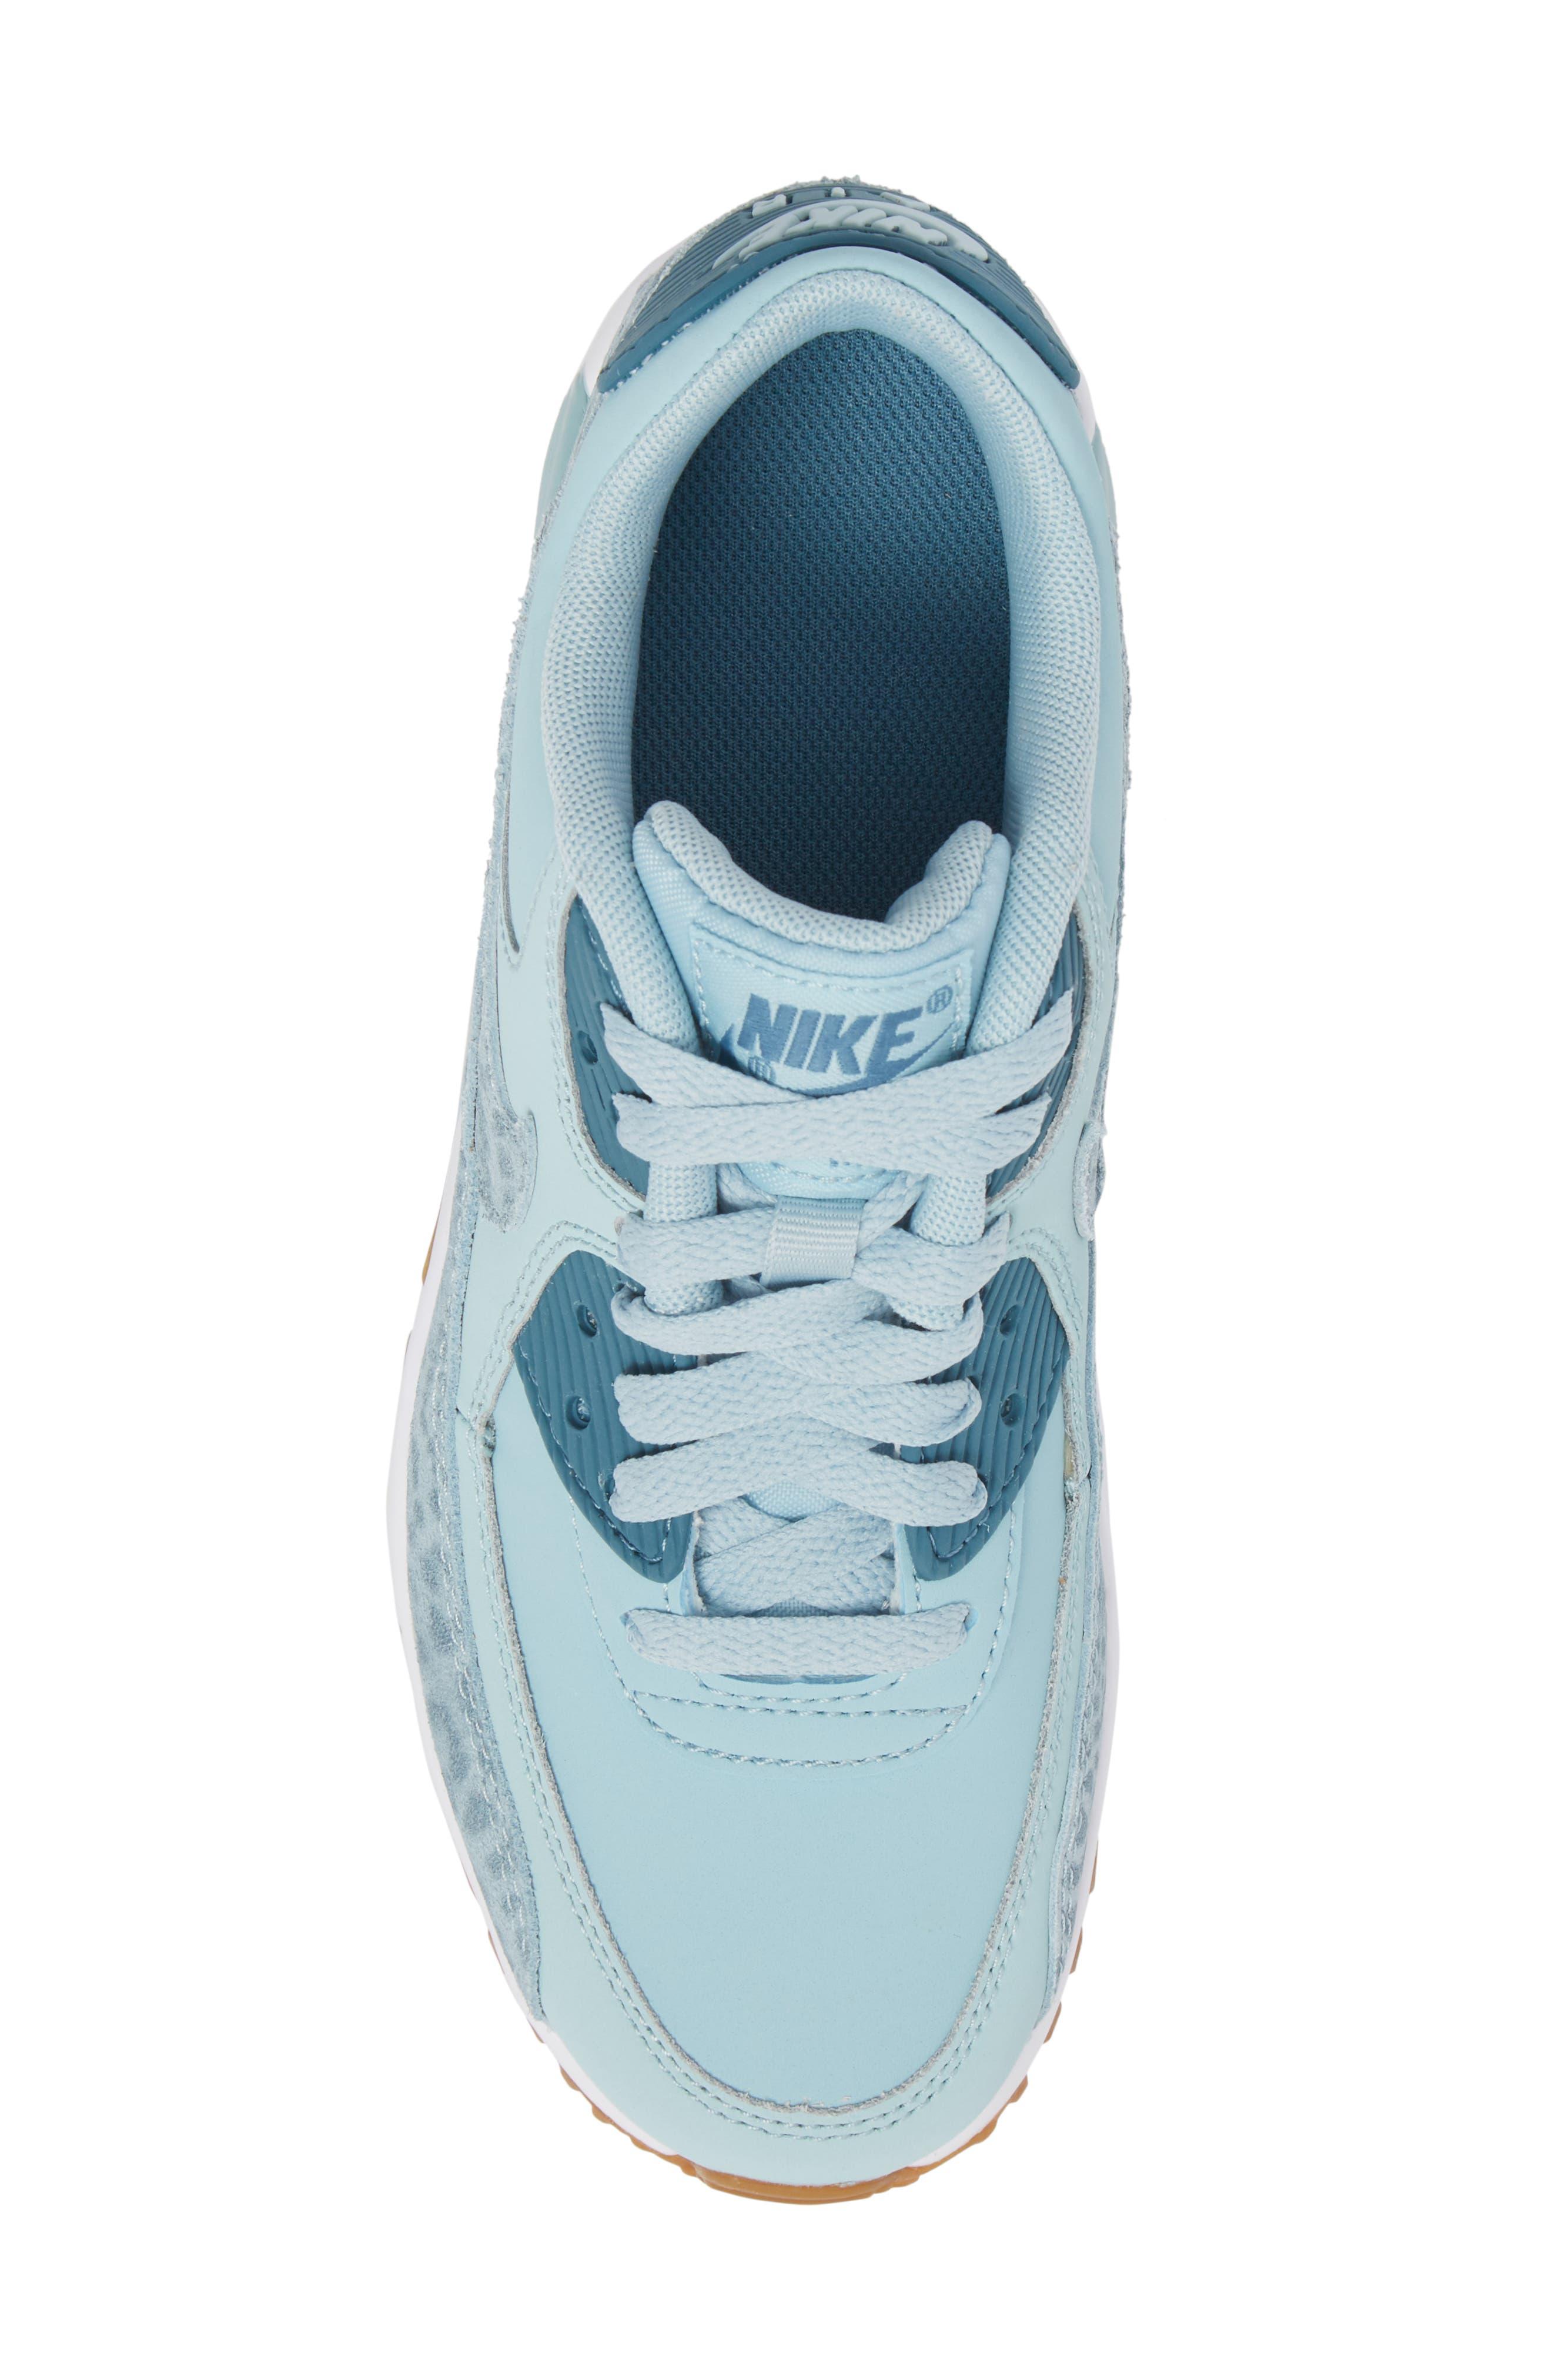 Air Max 90 Leather Sneaker,                             Alternate thumbnail 5, color,                             Ocean Bliss/ Noise Aqua/ White